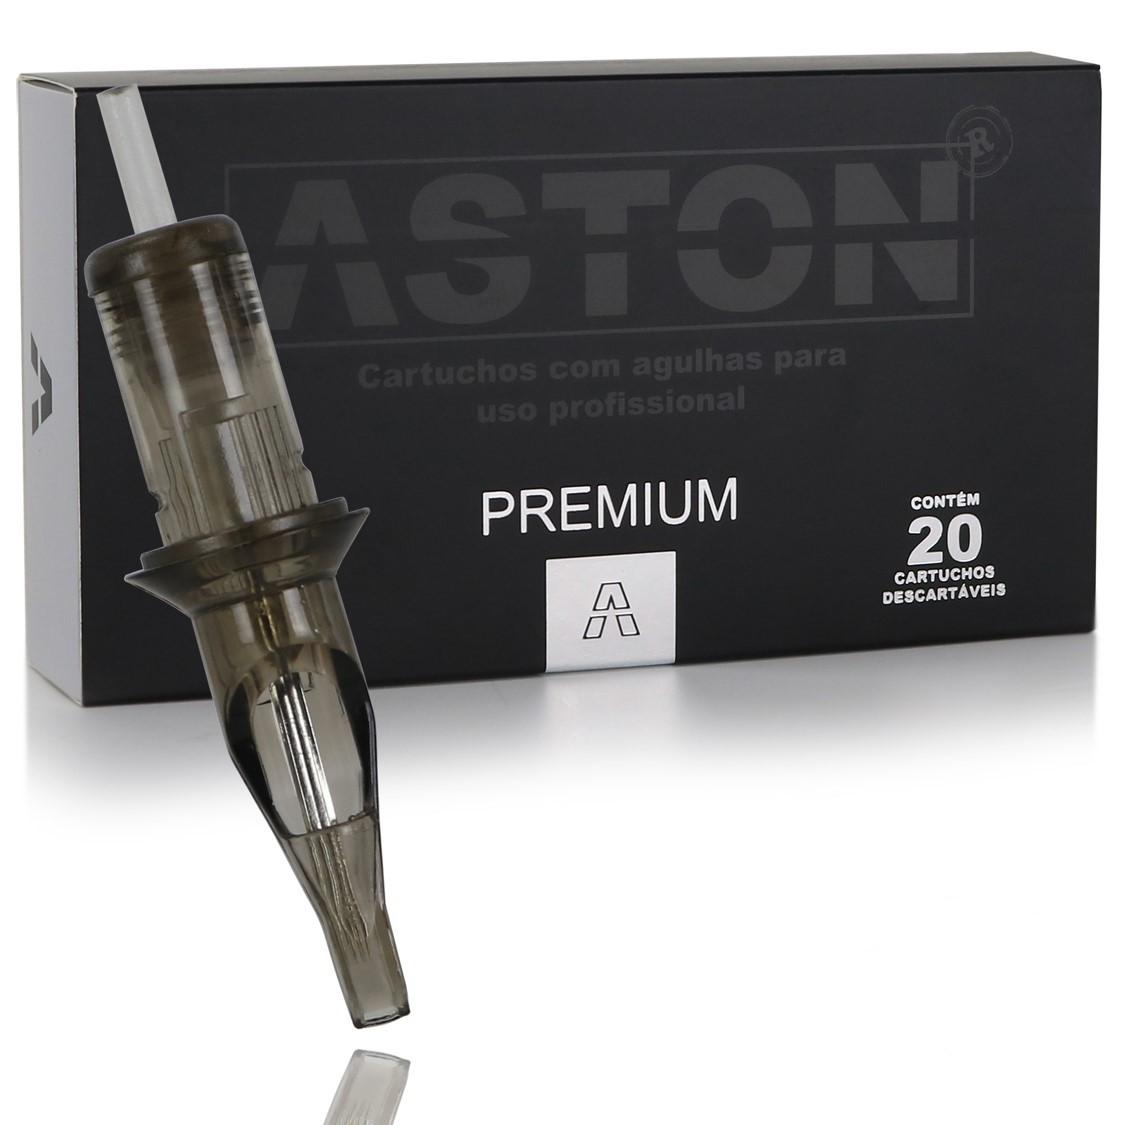 CAIXA CARTUCHO ASTON PREMIUM PINTURA MG (20 UN) - 1019MG